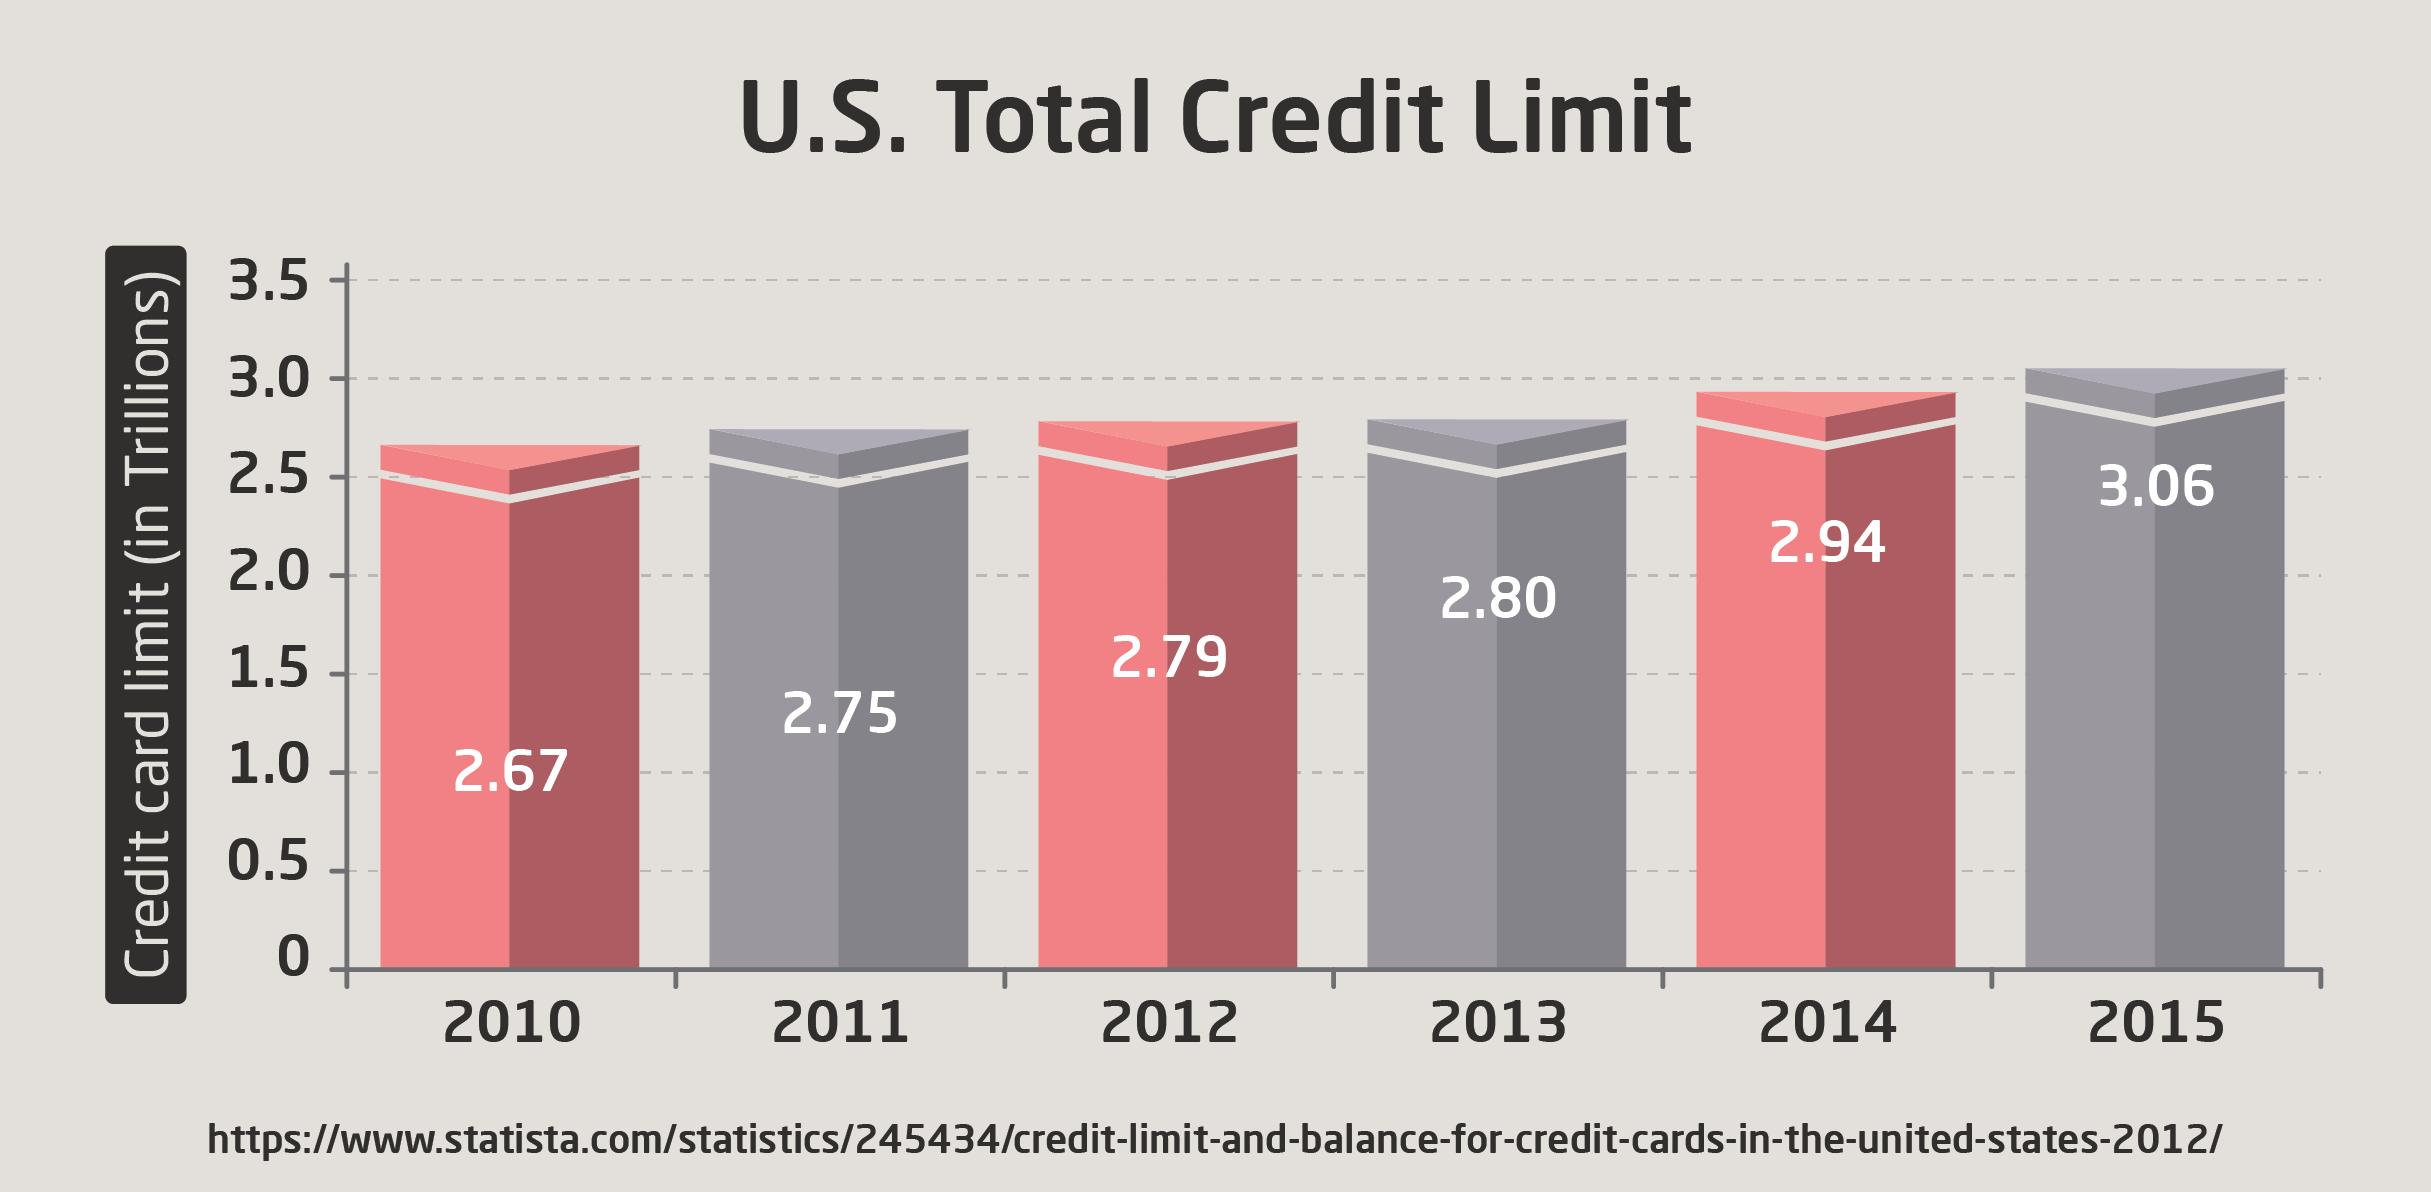 U.S. Total Credit Limit